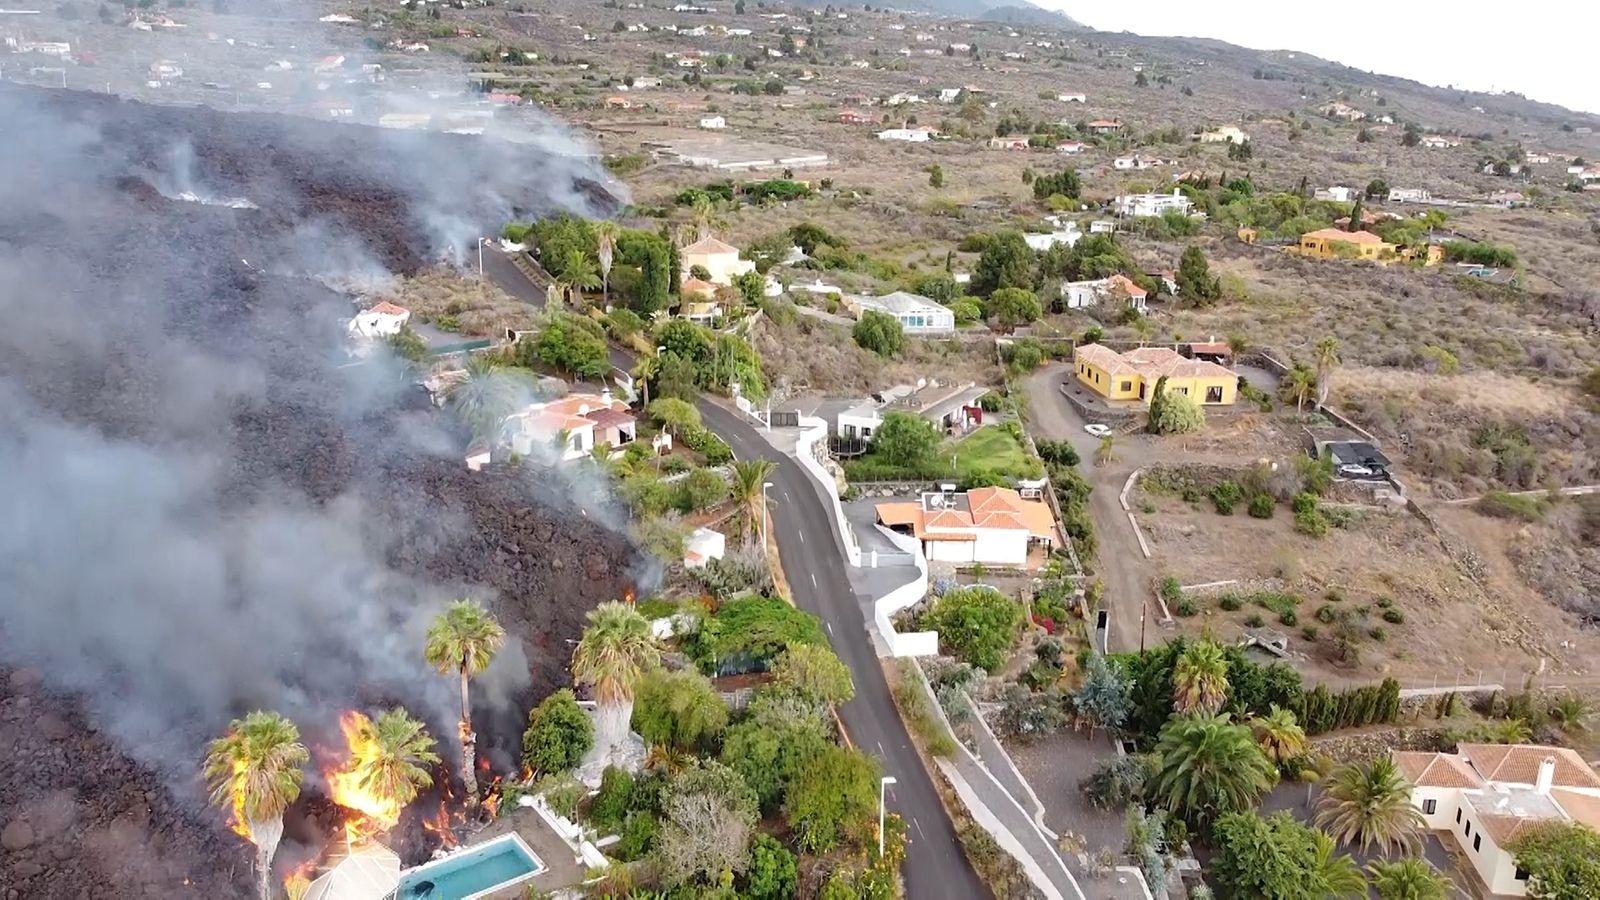 Vulkanausbruch auf Kanareninsel La Palma